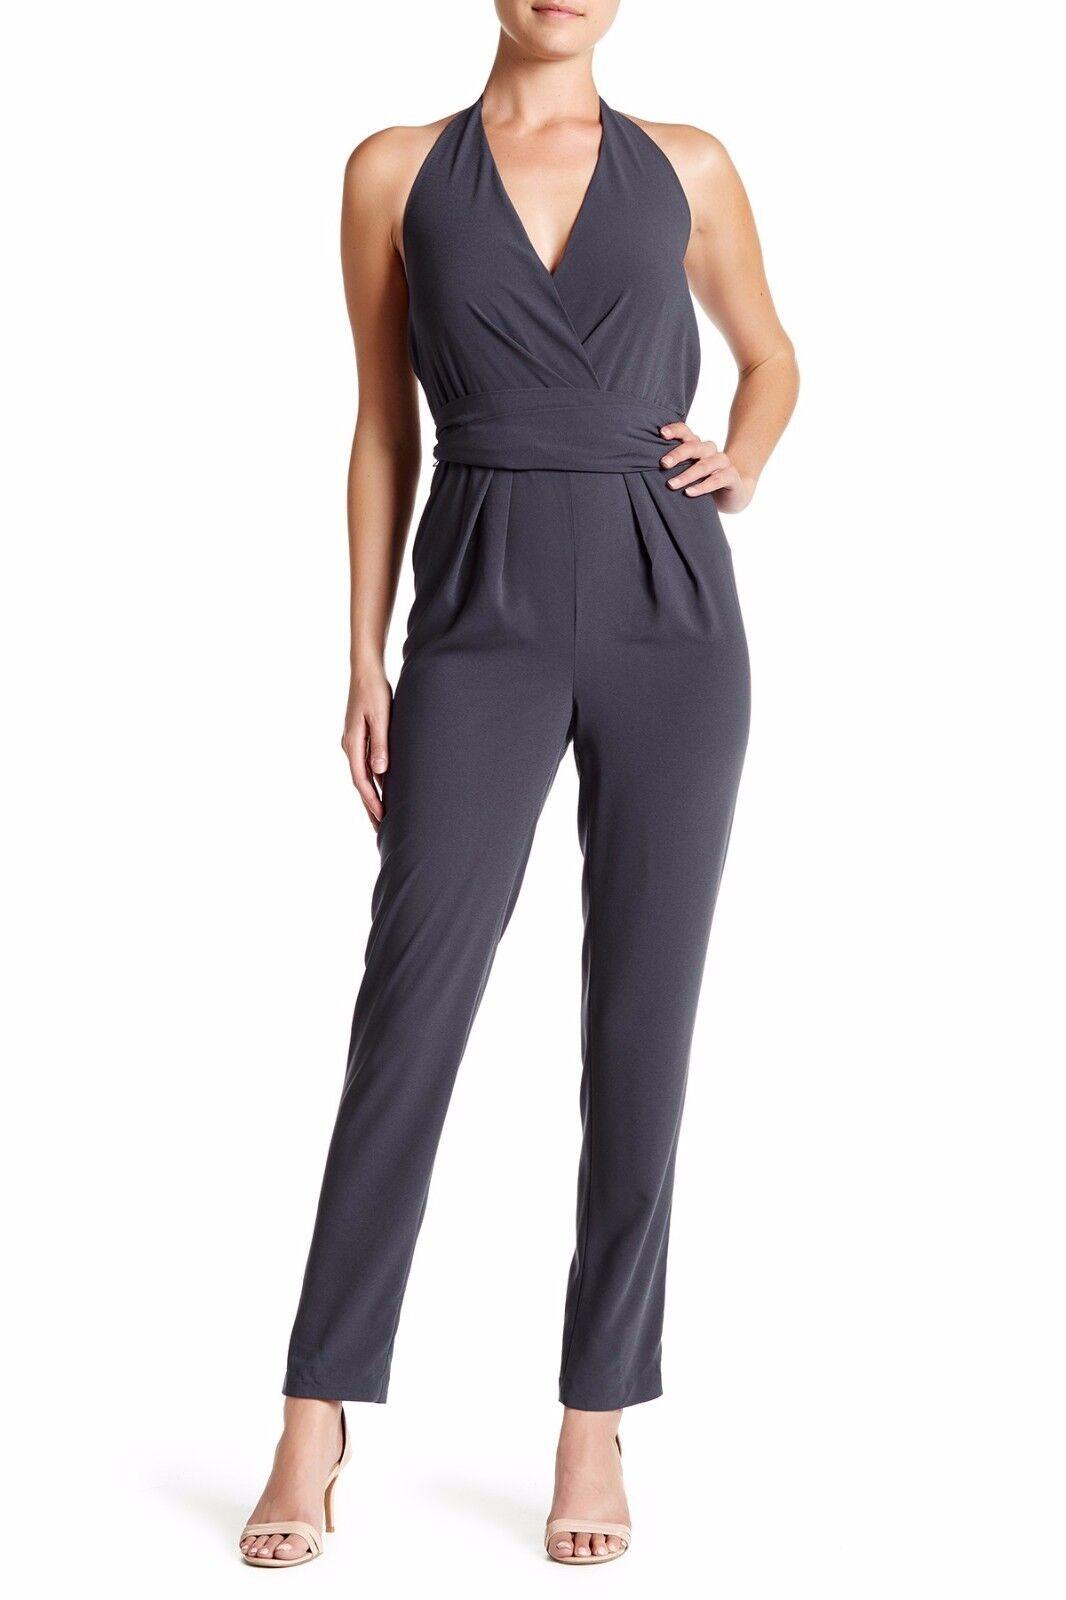 Halston Heritage Halter Self-Tie Jumpsuit Size 6 MSRP   525.00